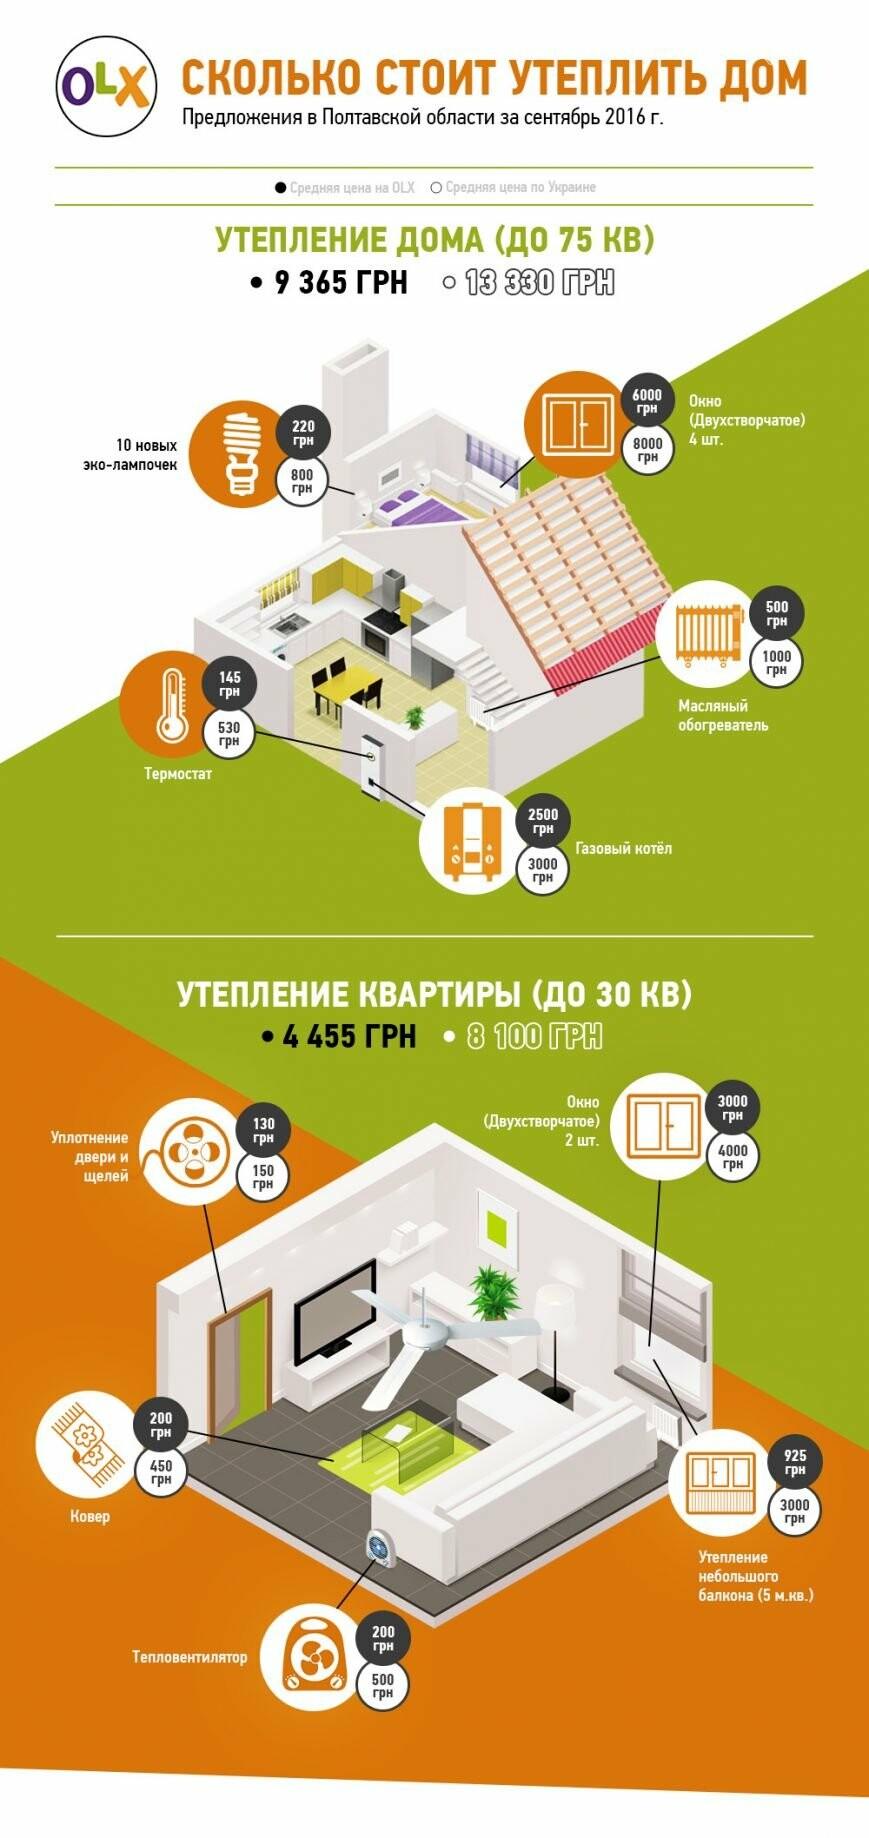 2016-09-26 Hoshva PR OLX Poltava info_ru